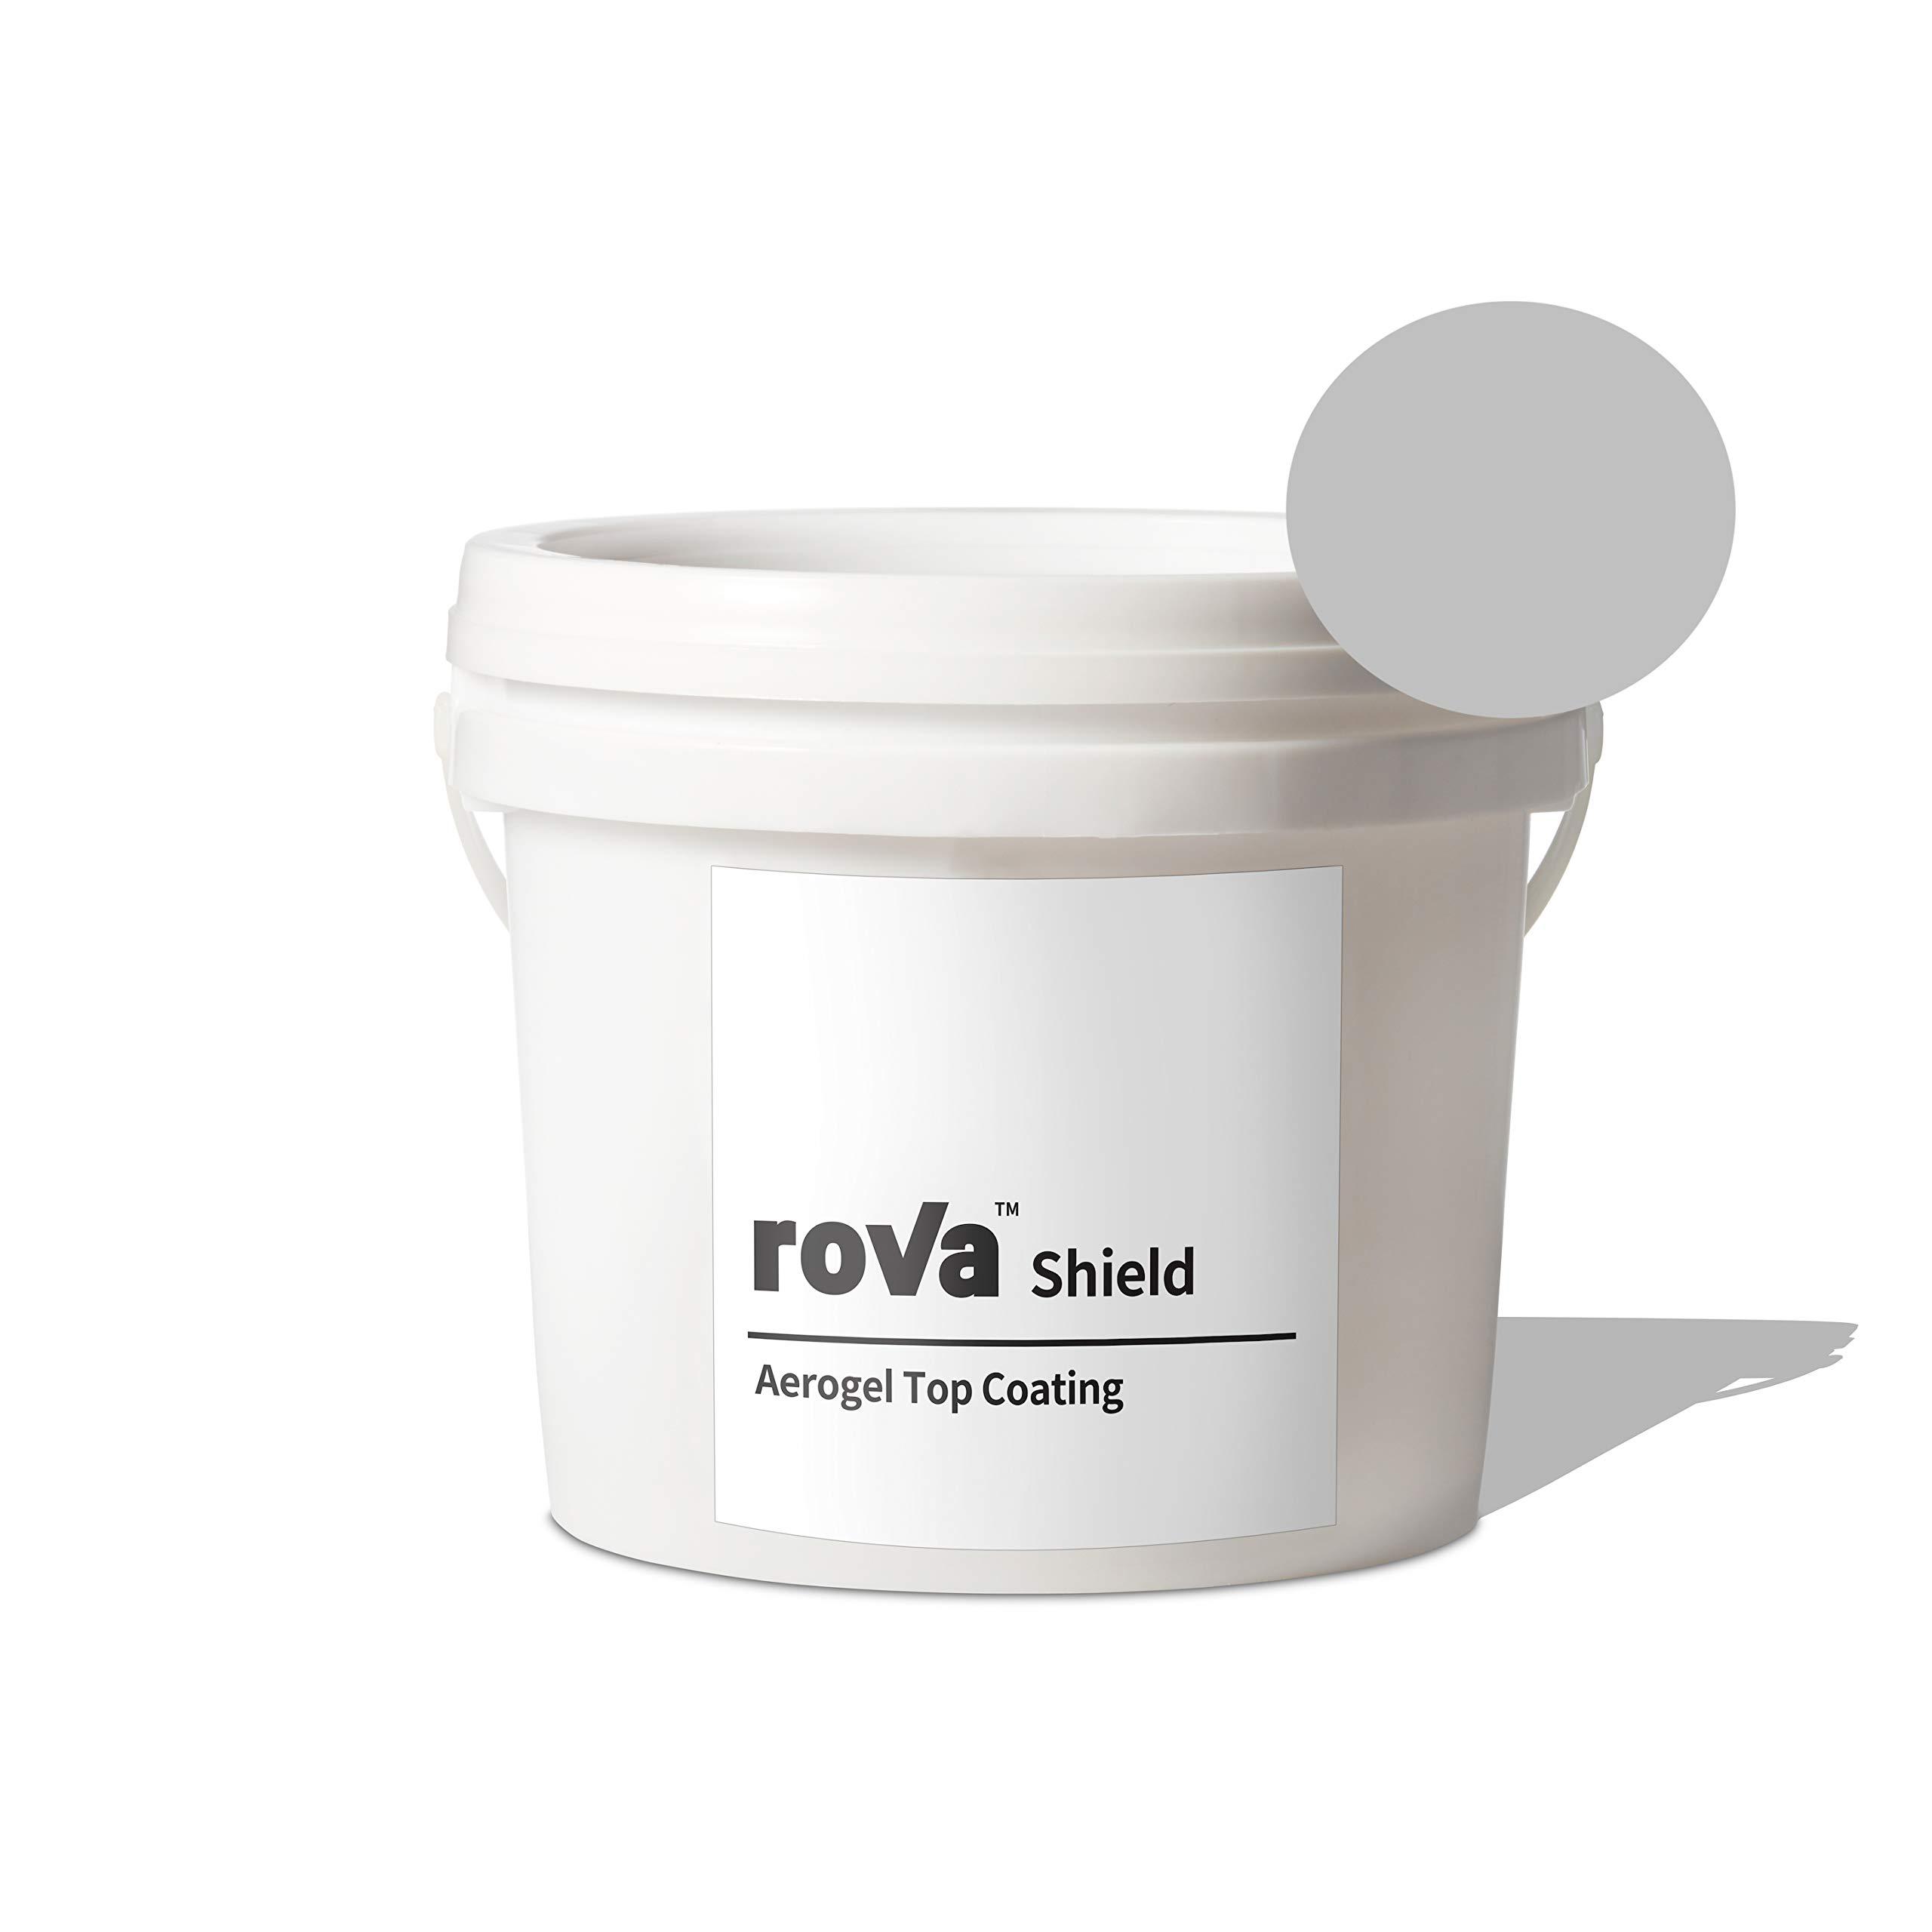 roVa Shield Aerogel Top Coating, Color Grey 1 Quart (1 Liter) by roVa (Image #1)